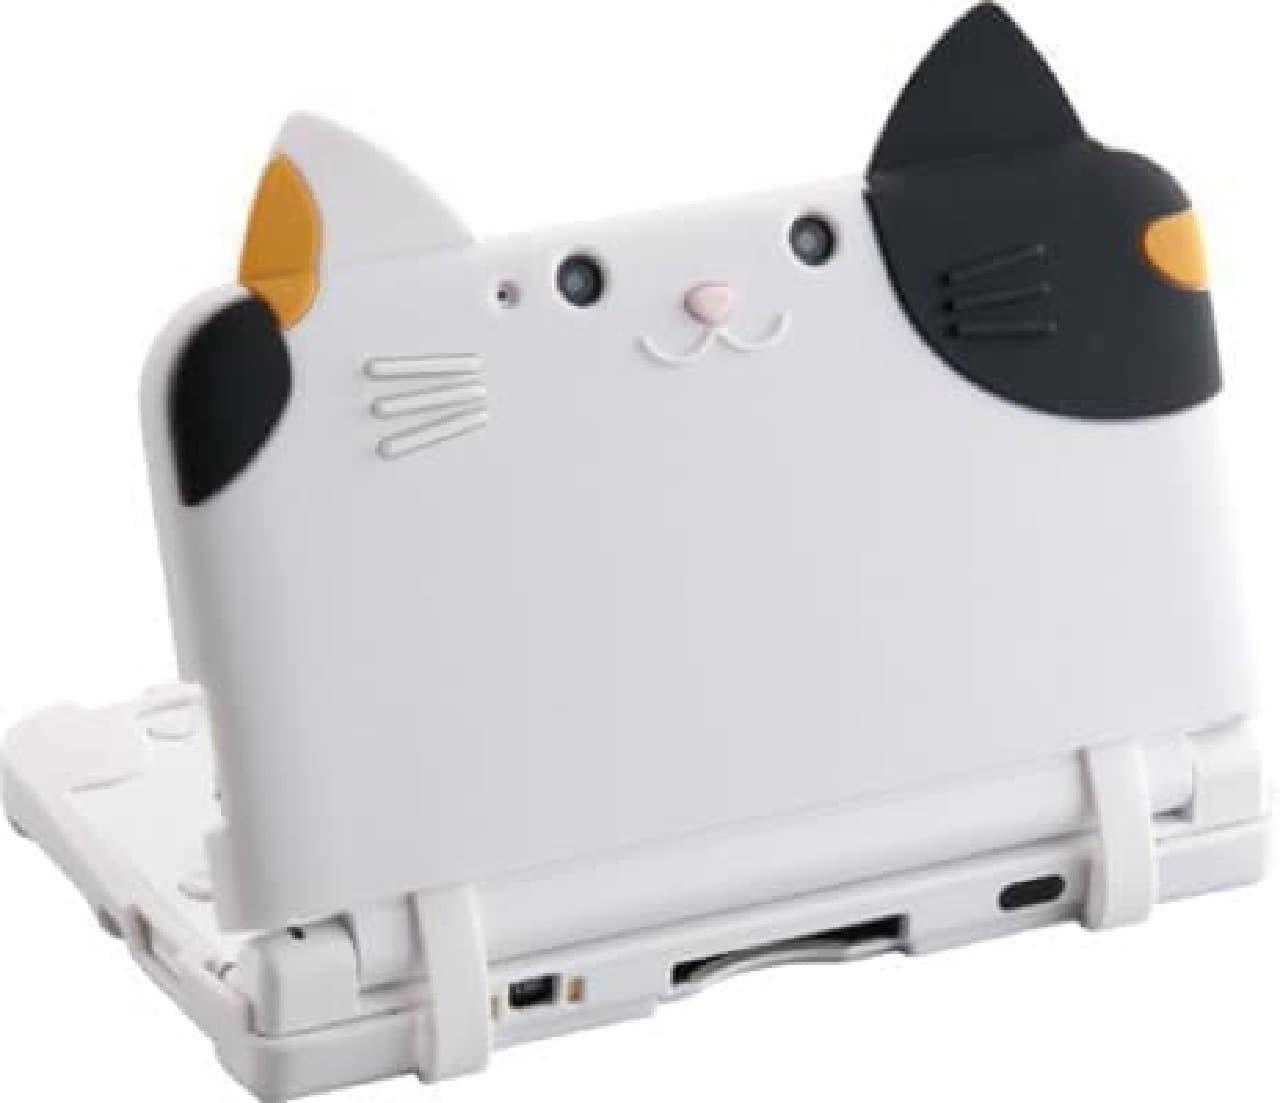 3DS LL がキュートなネコに変身